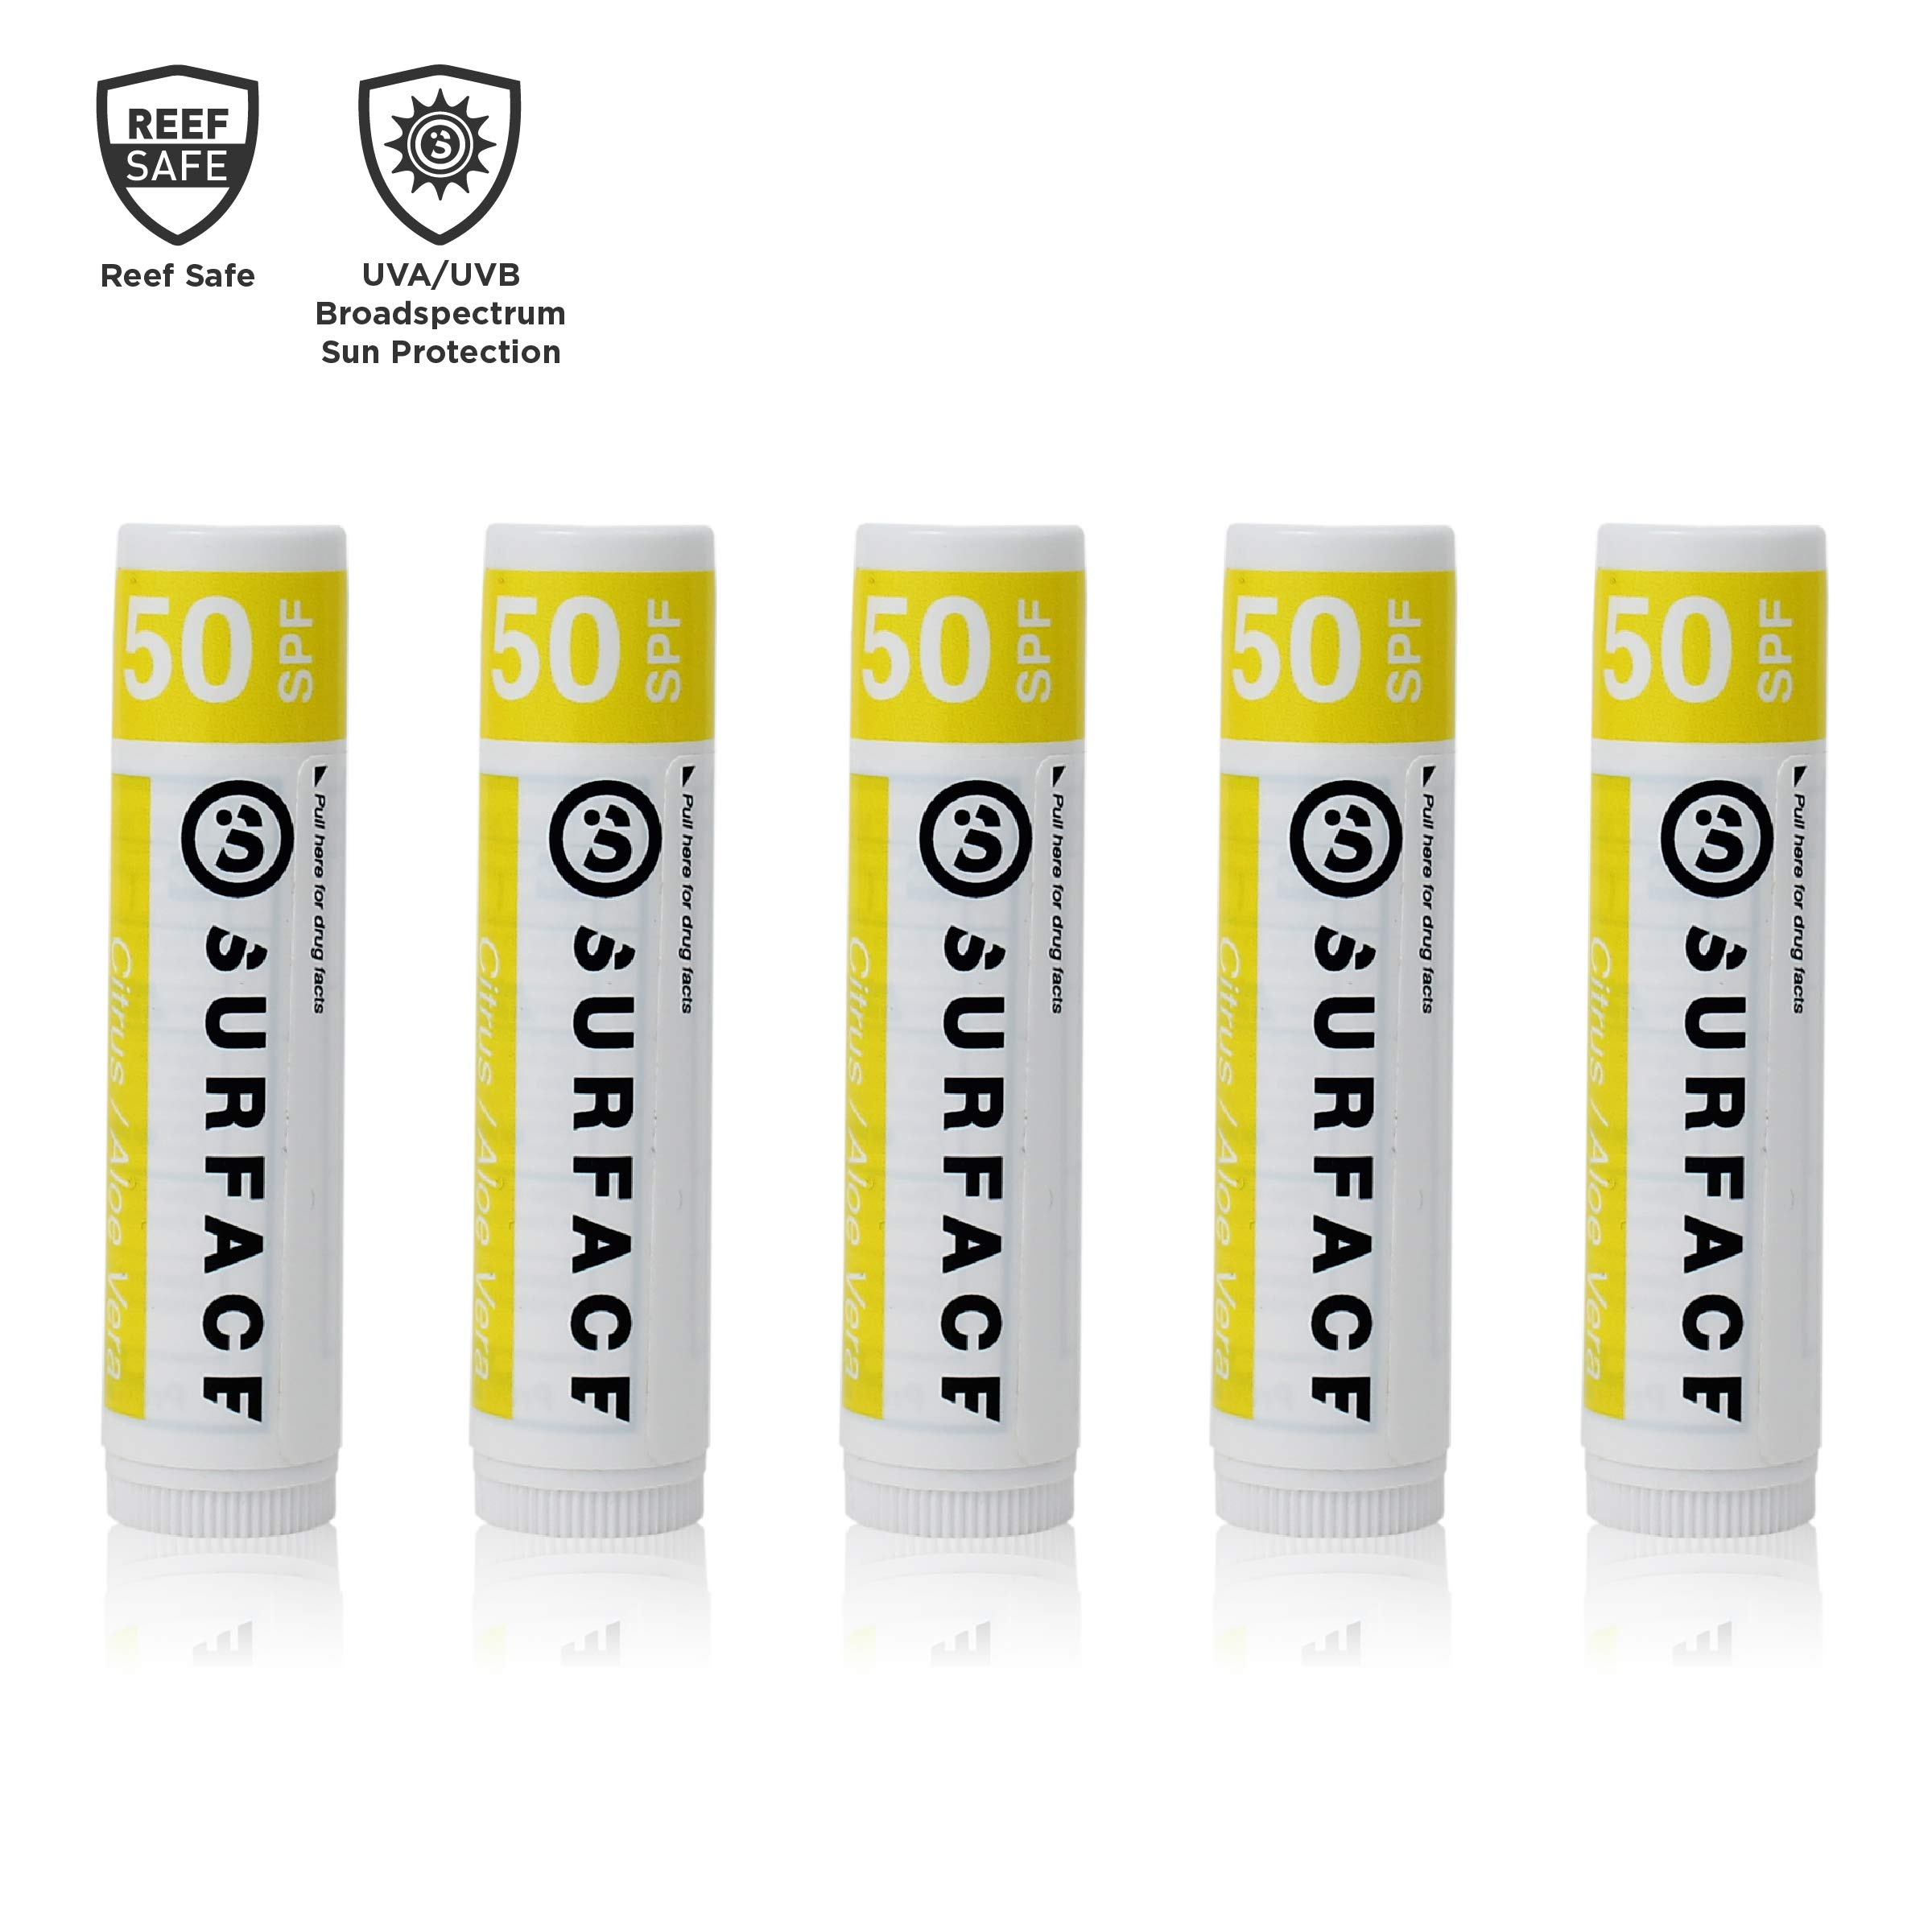 Surface Citrus & Aloe Vera Lip Balm with SPF 50 & Vitamin E - Reef Safe, Broad Spectrum UVA/UVB Protection - Petroleum, Paraben & Gluten Free - 5 Pack